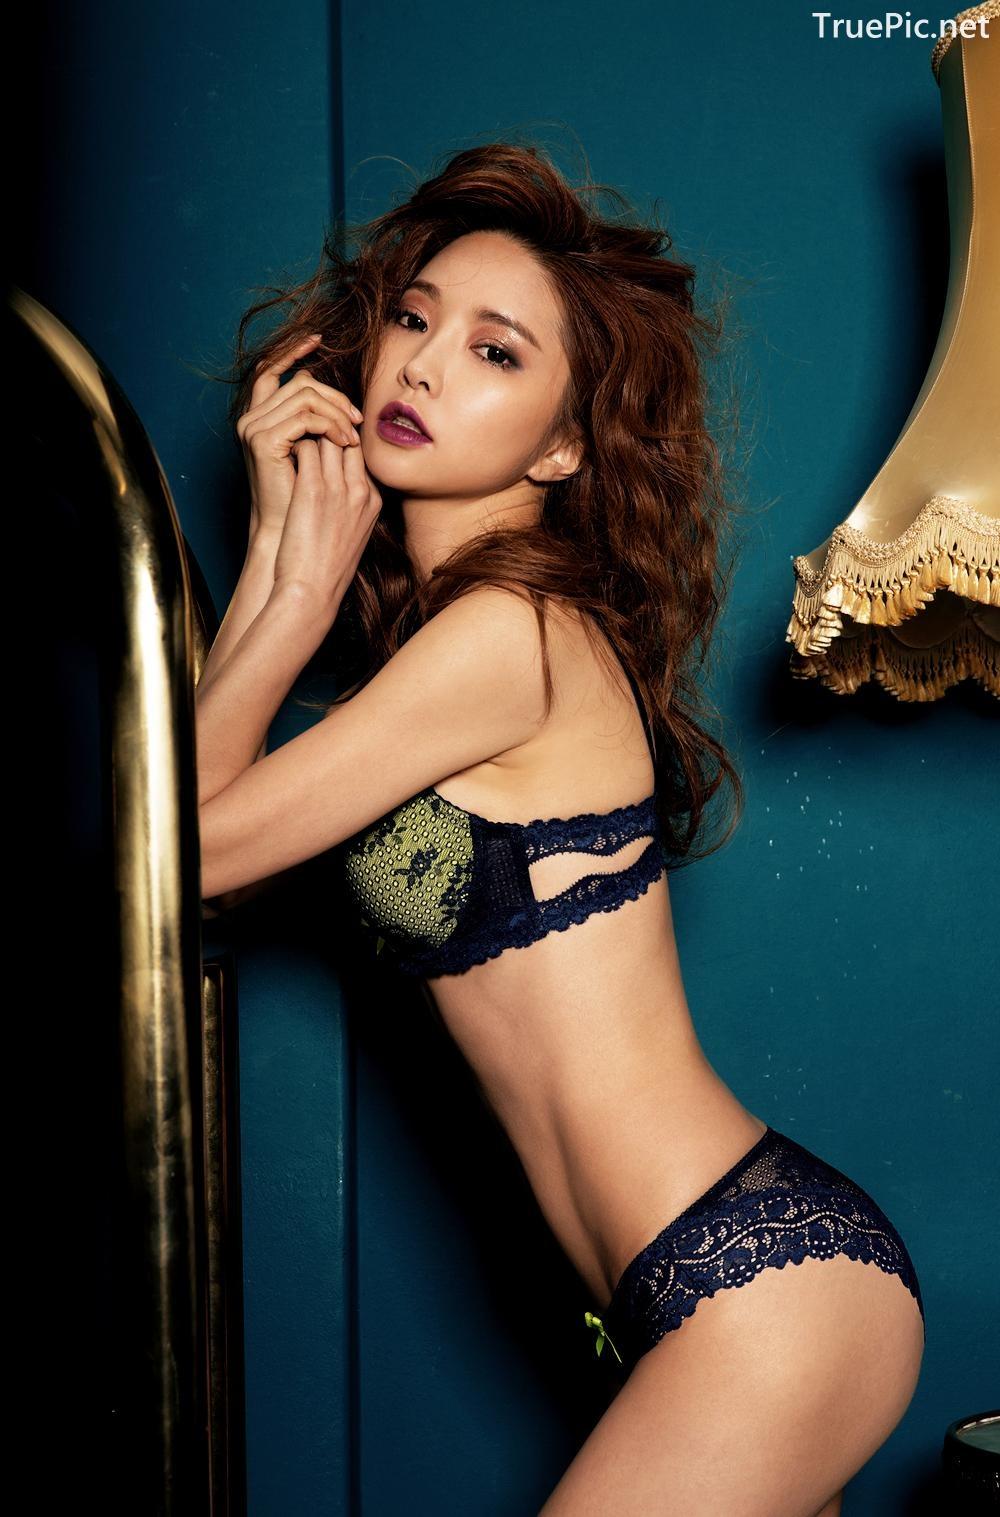 Image Korean Fashion Model - Park Soo Yeon - BVB Black Lace Lingerie - TruePic.net - Picture-1